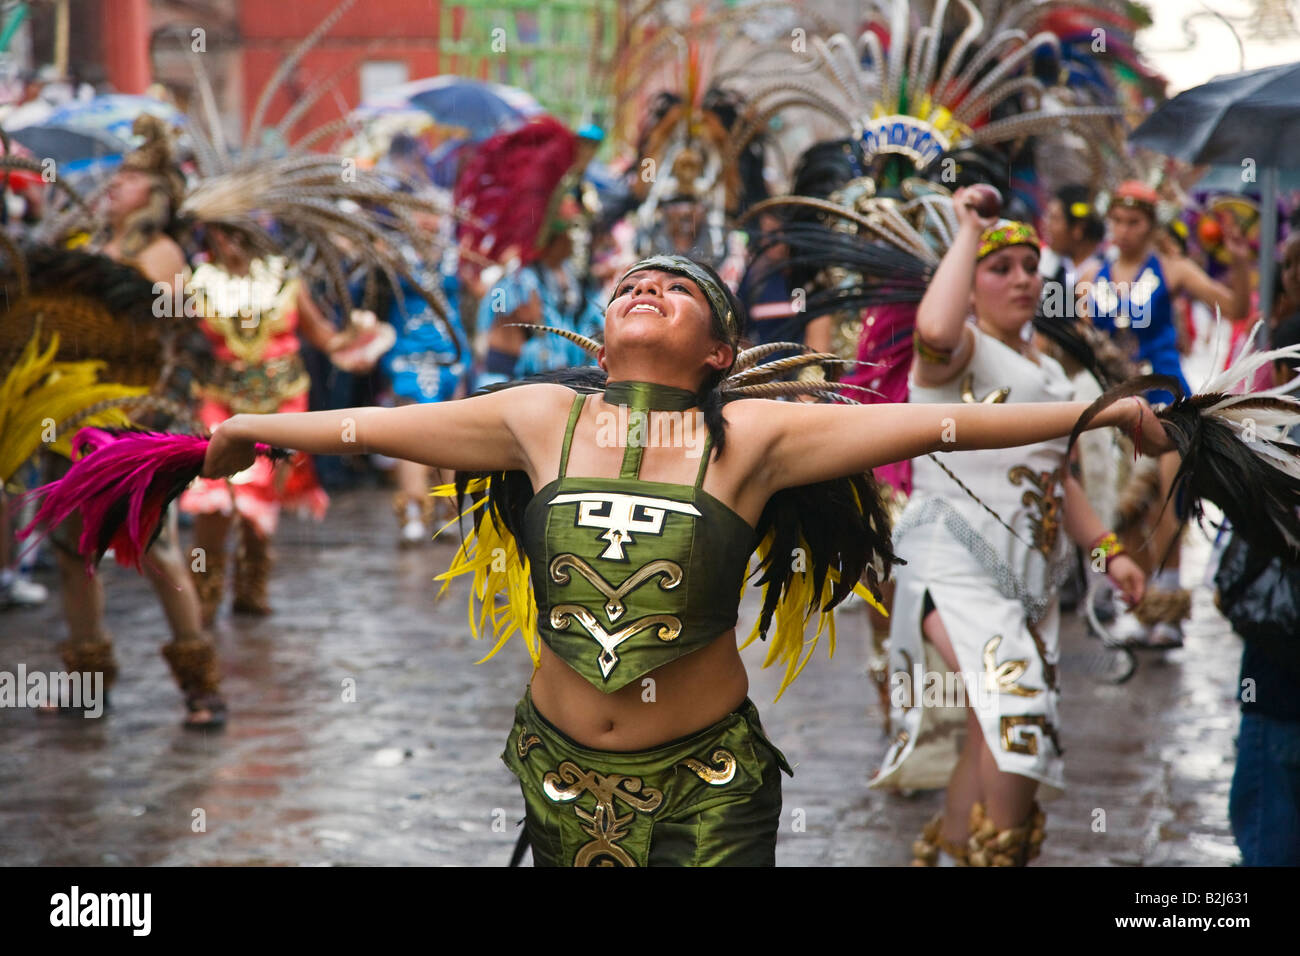 Mexican Women Dance In Aztec Indian Costumes In The Festival De San B J on Aztec Indian Dancers